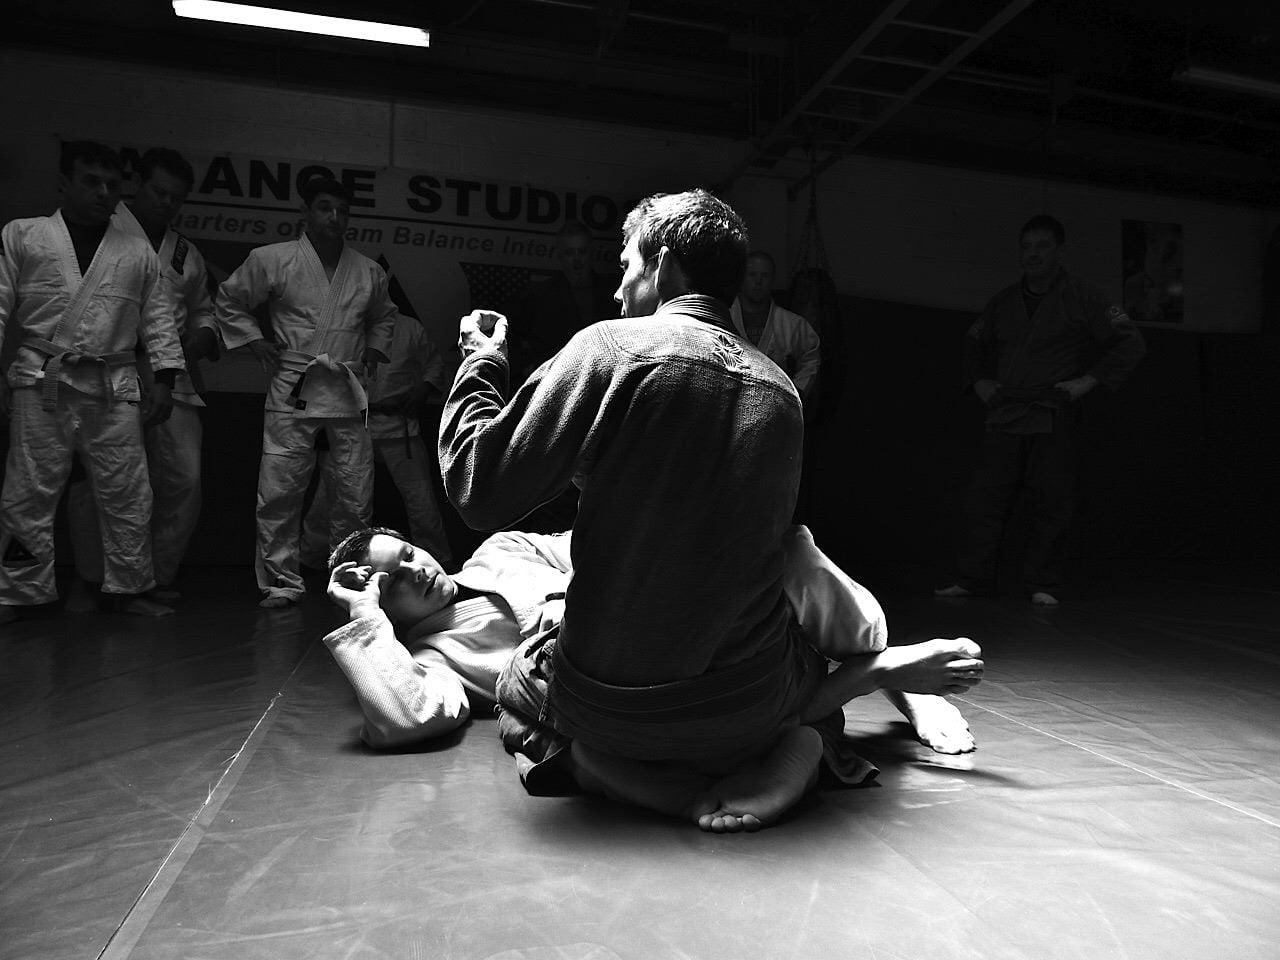 Team Balance Josh Vogel Jitsu Seminar at Komar Jiu Jitsu Academy